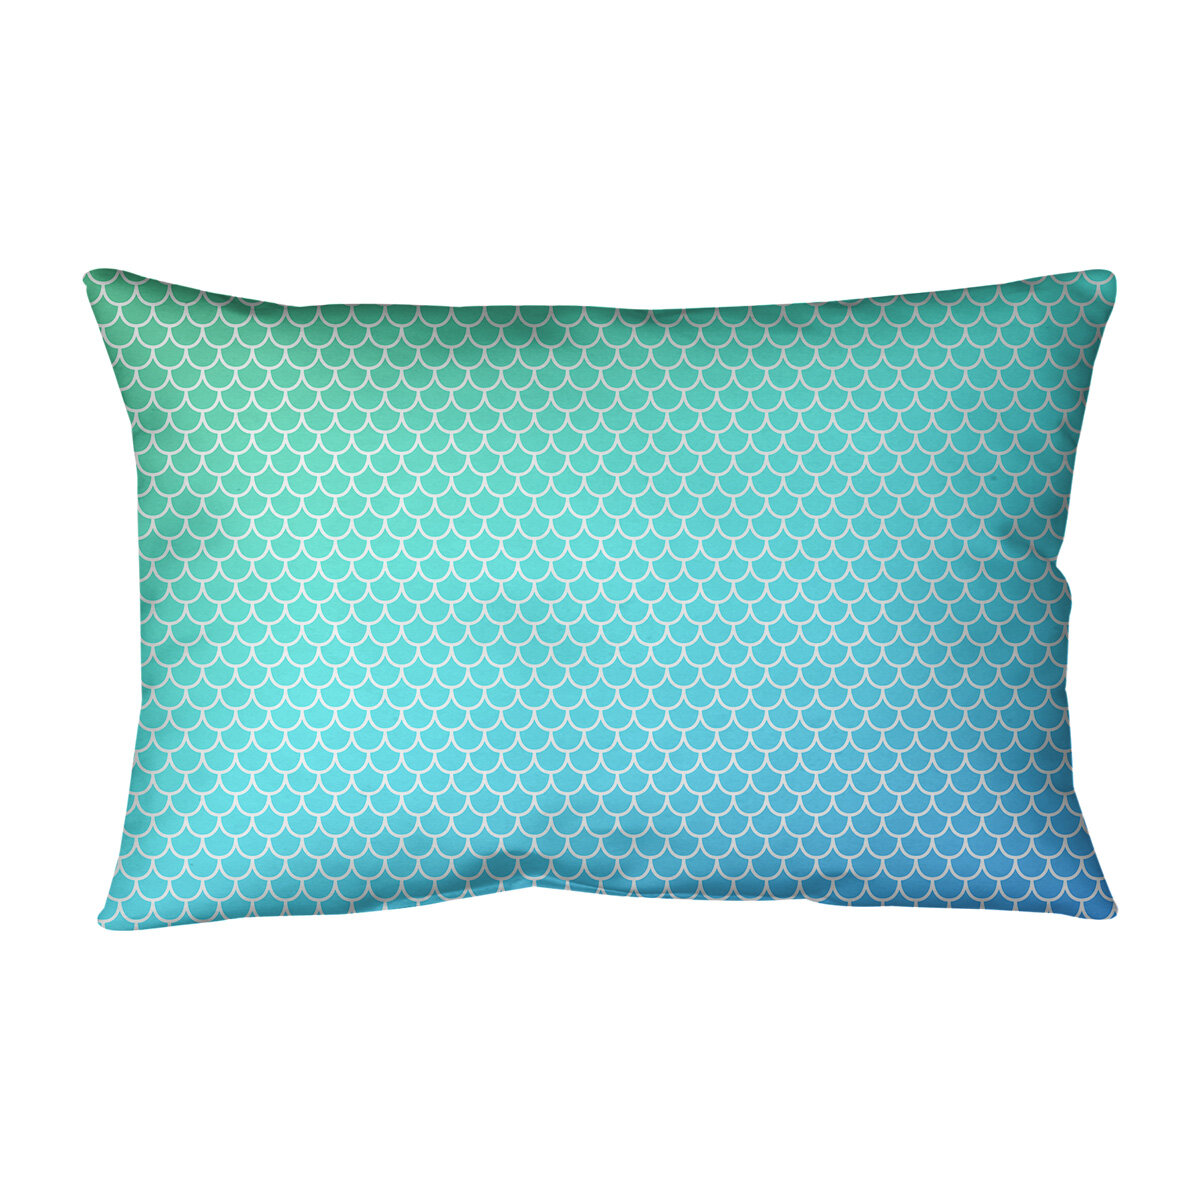 East Urban Home Mermaid Scales Rectangular Pillow Cover Wayfair Ca